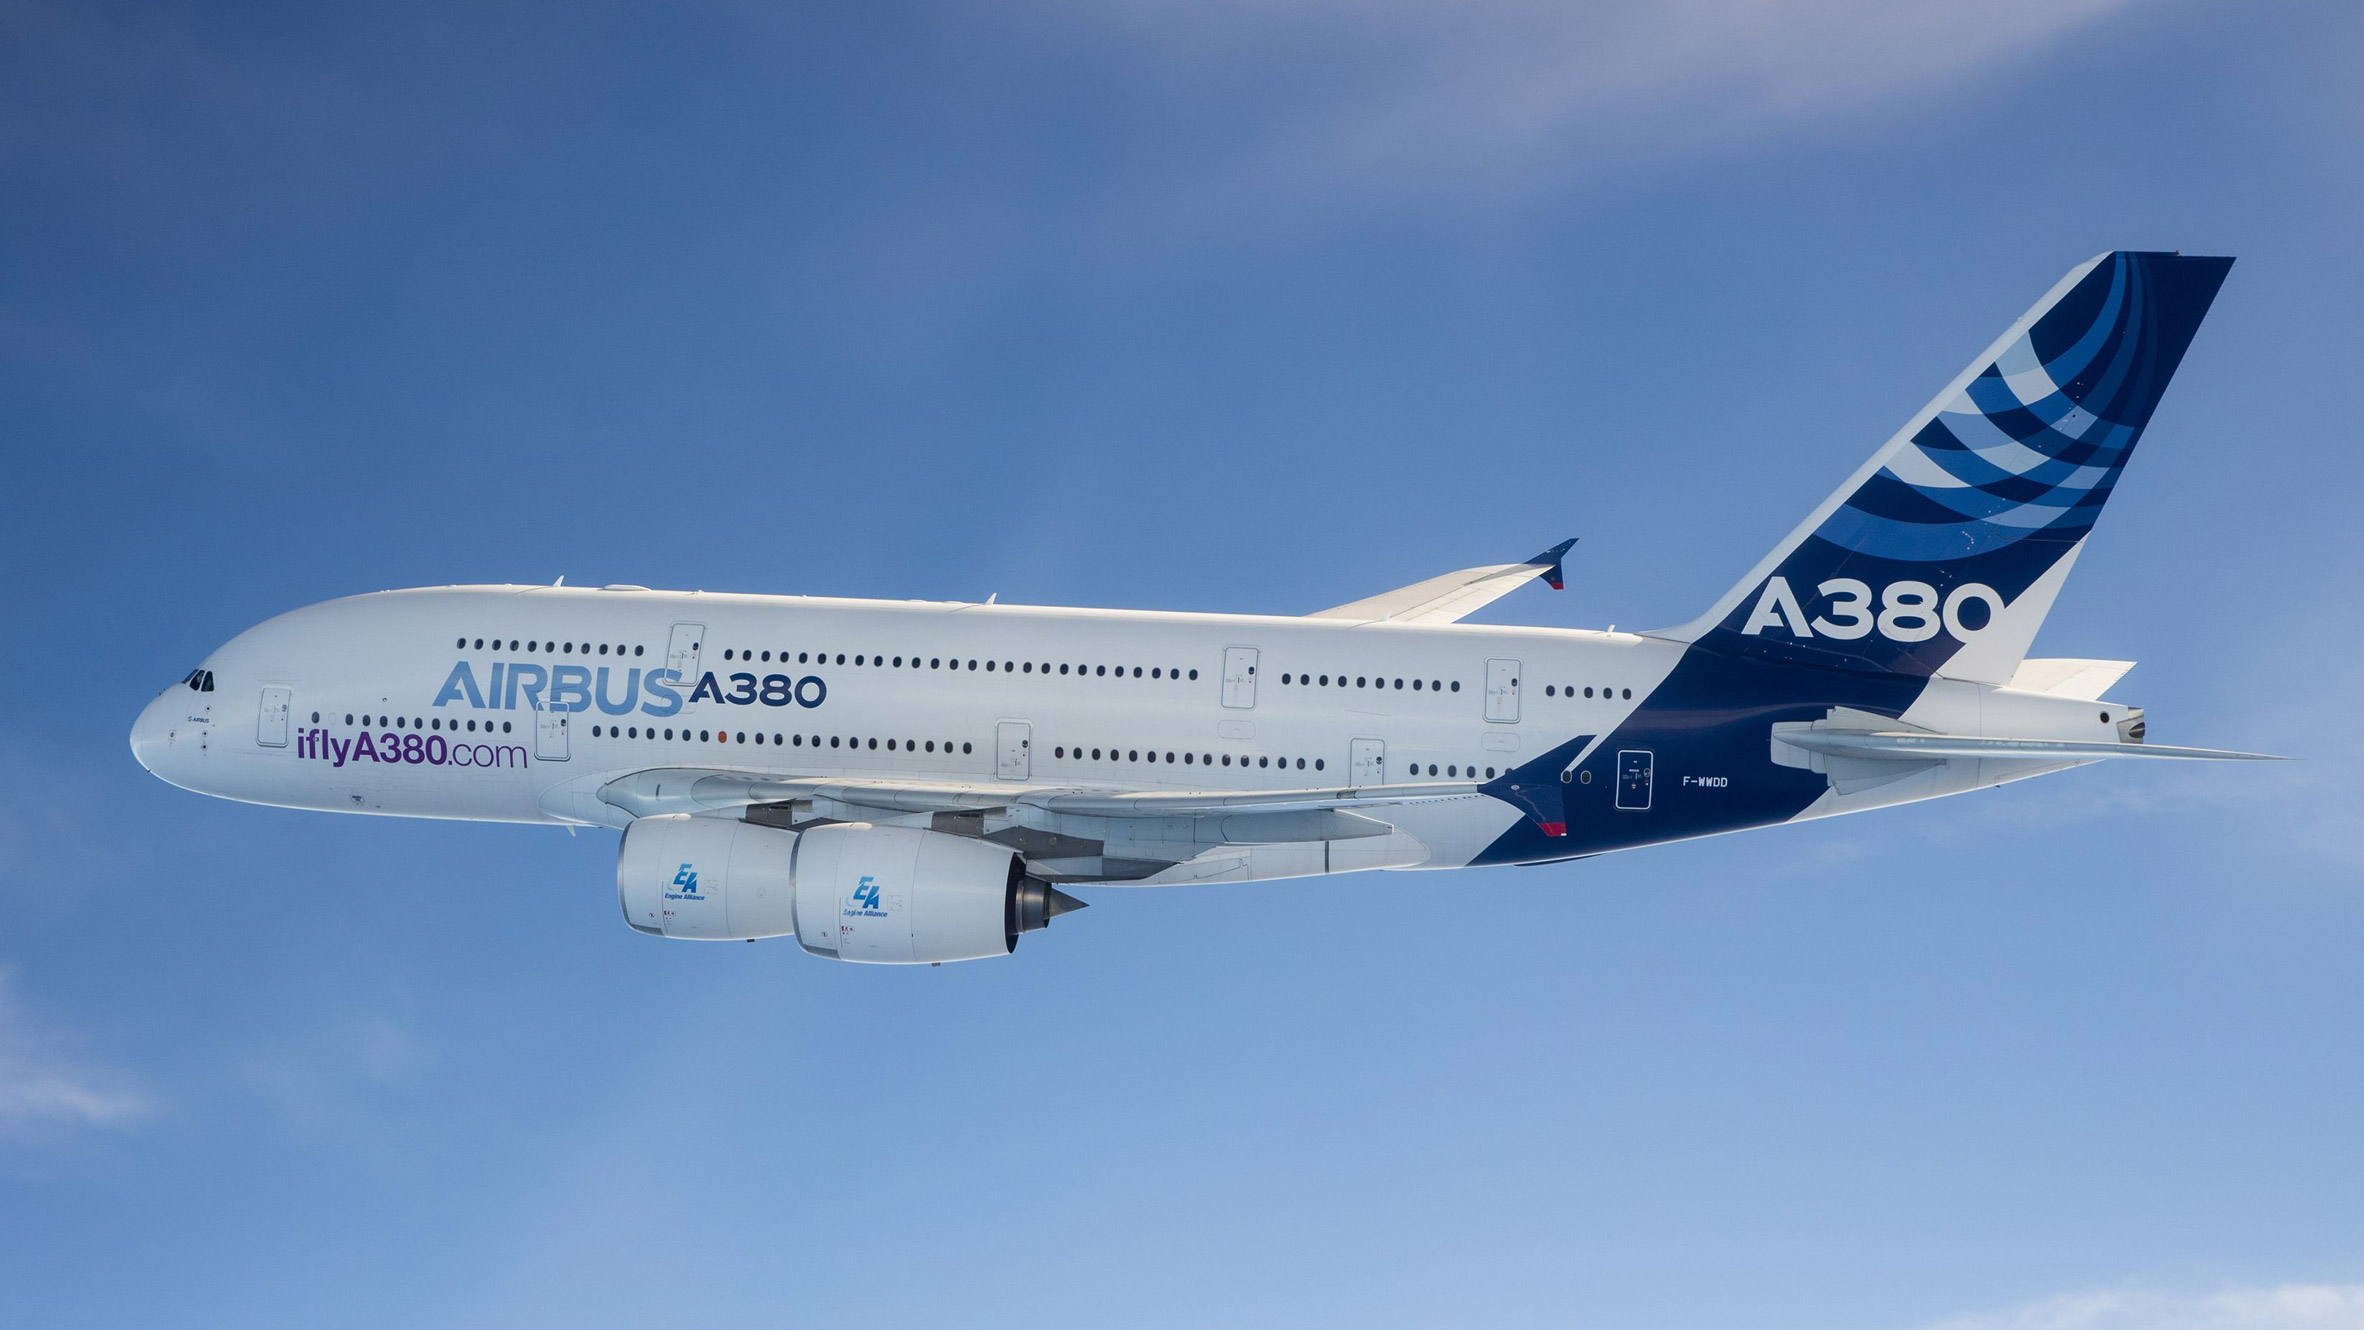 dezeen.com - Natashah Hitti - The Airbus A380 was a 'dream project' that changed aircraft interior design, says Paul Priestman